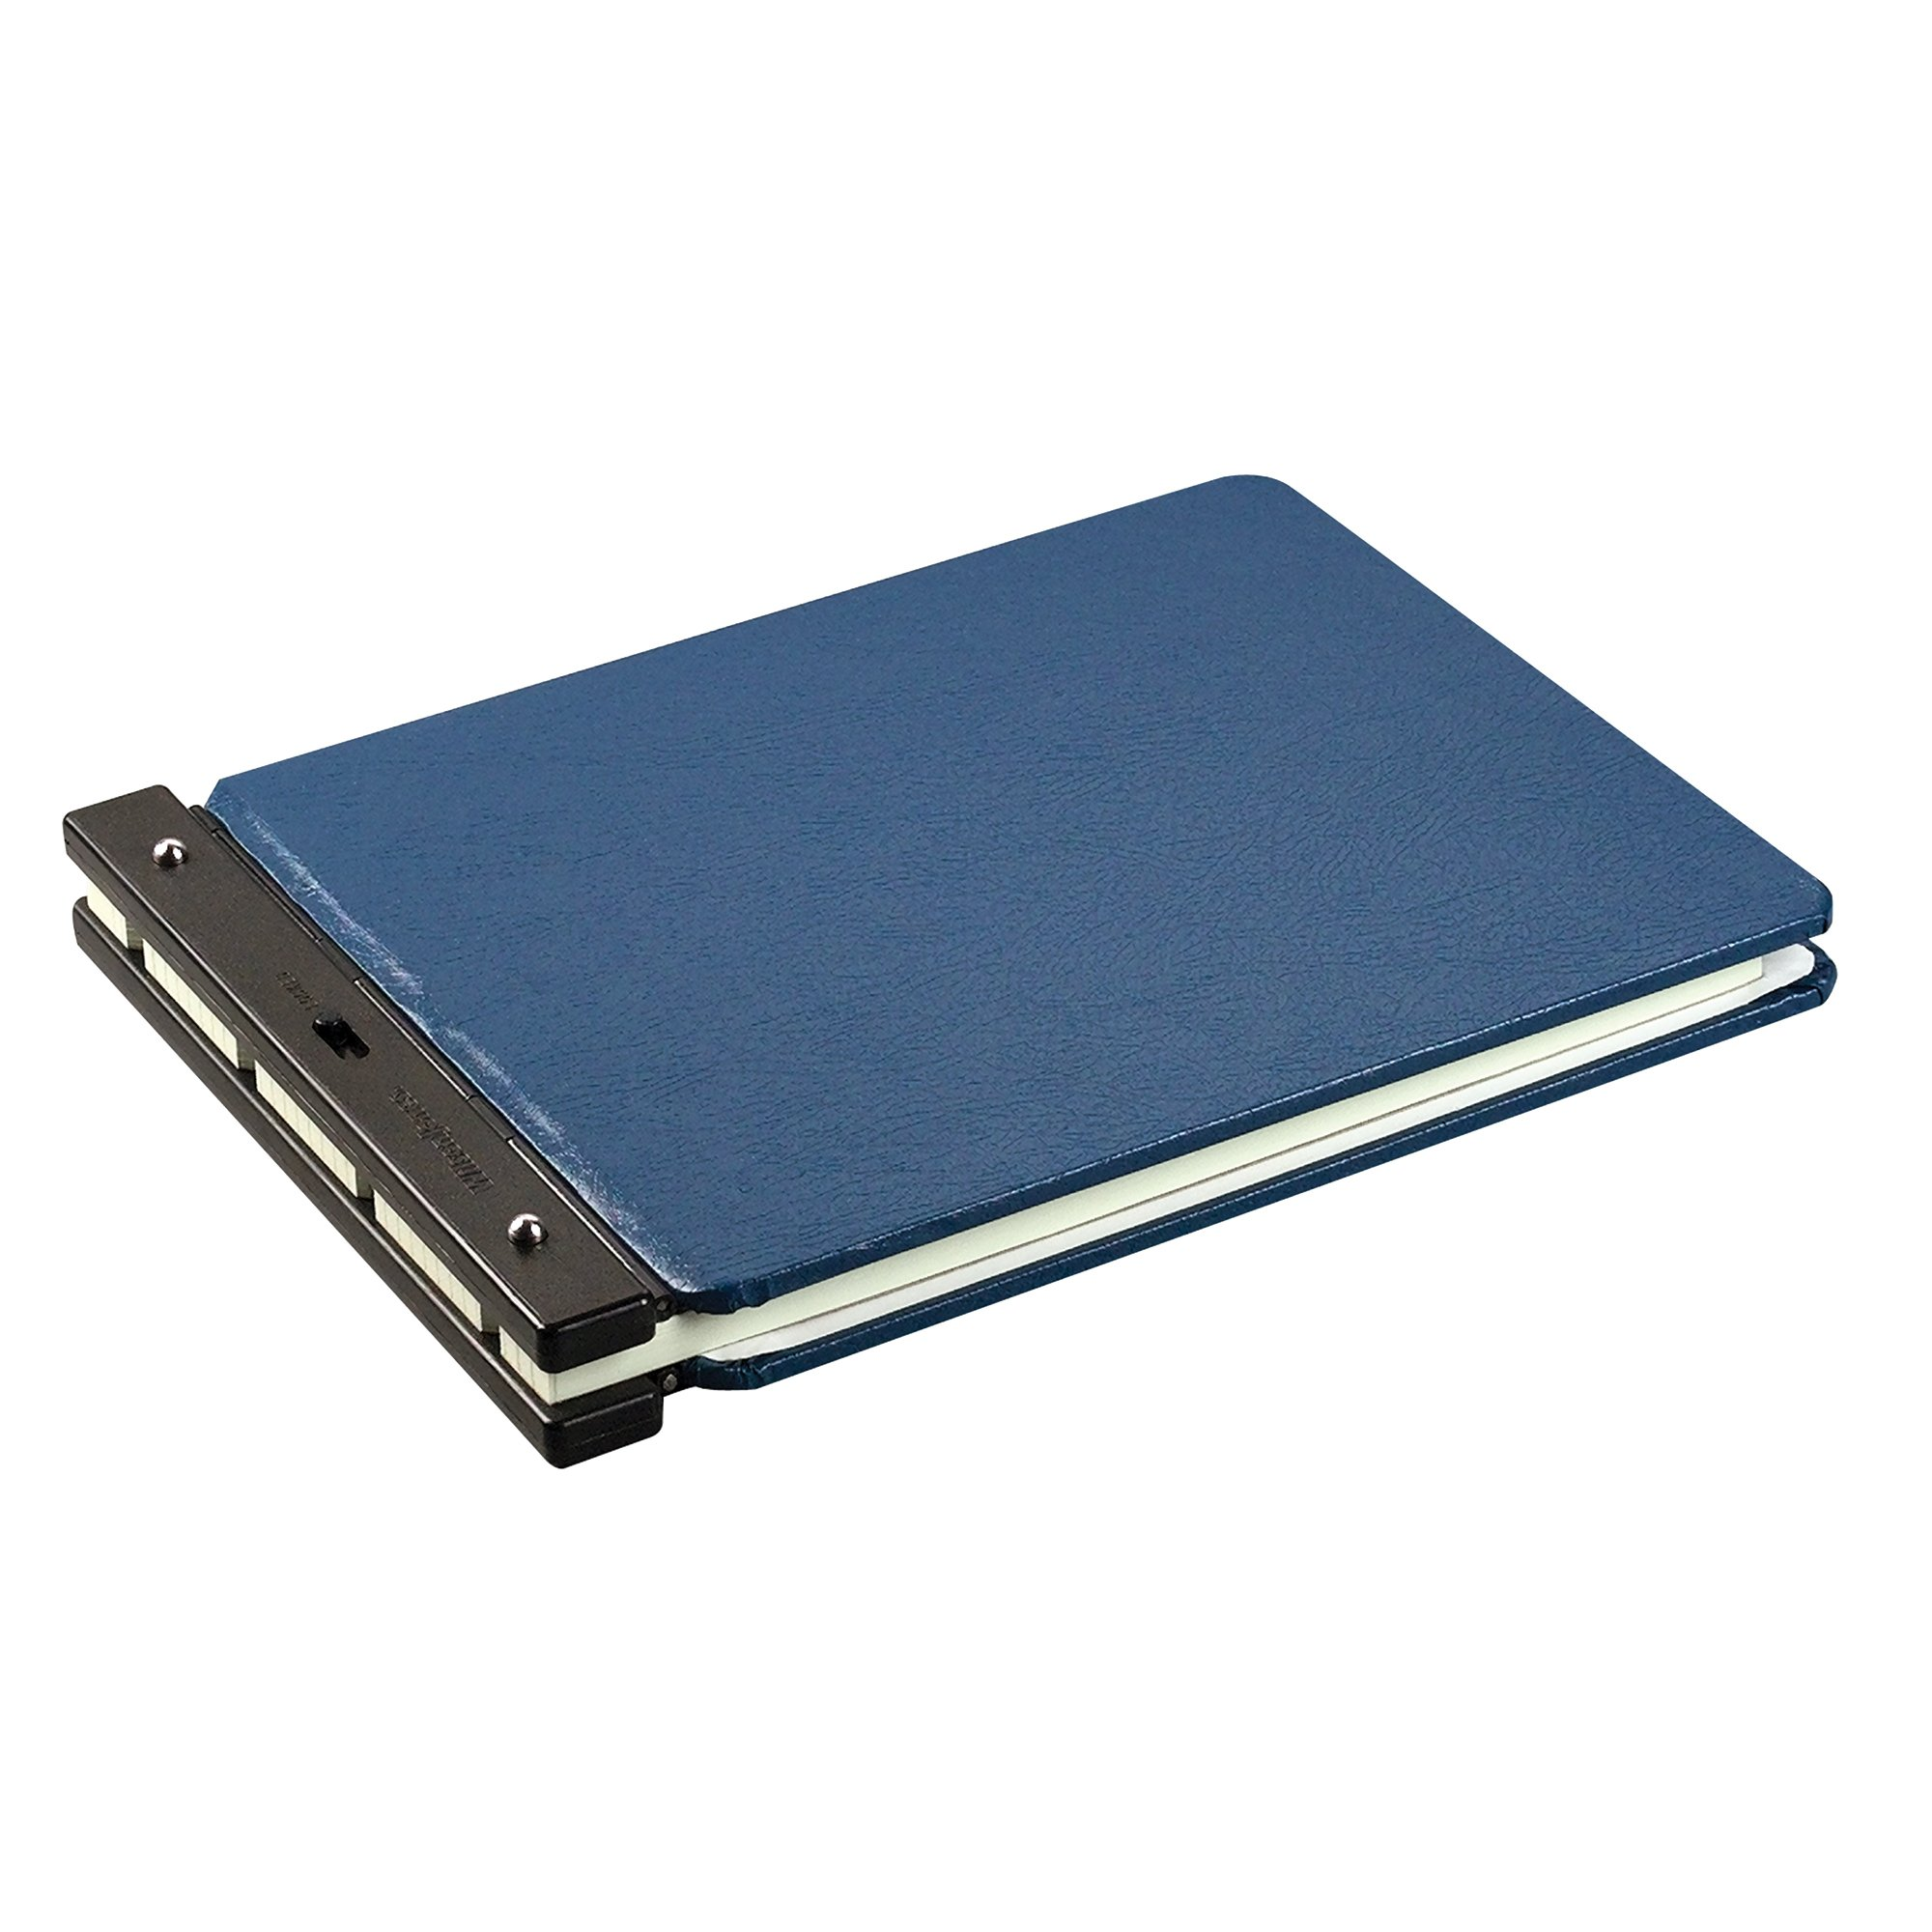 Wilson Jones Nomad Vinyl-Guarded Binder, 9 1/2 x 11 7/8 Inches, 5/16 Inch Post Diameter, Light Blue, (W226-40NA)